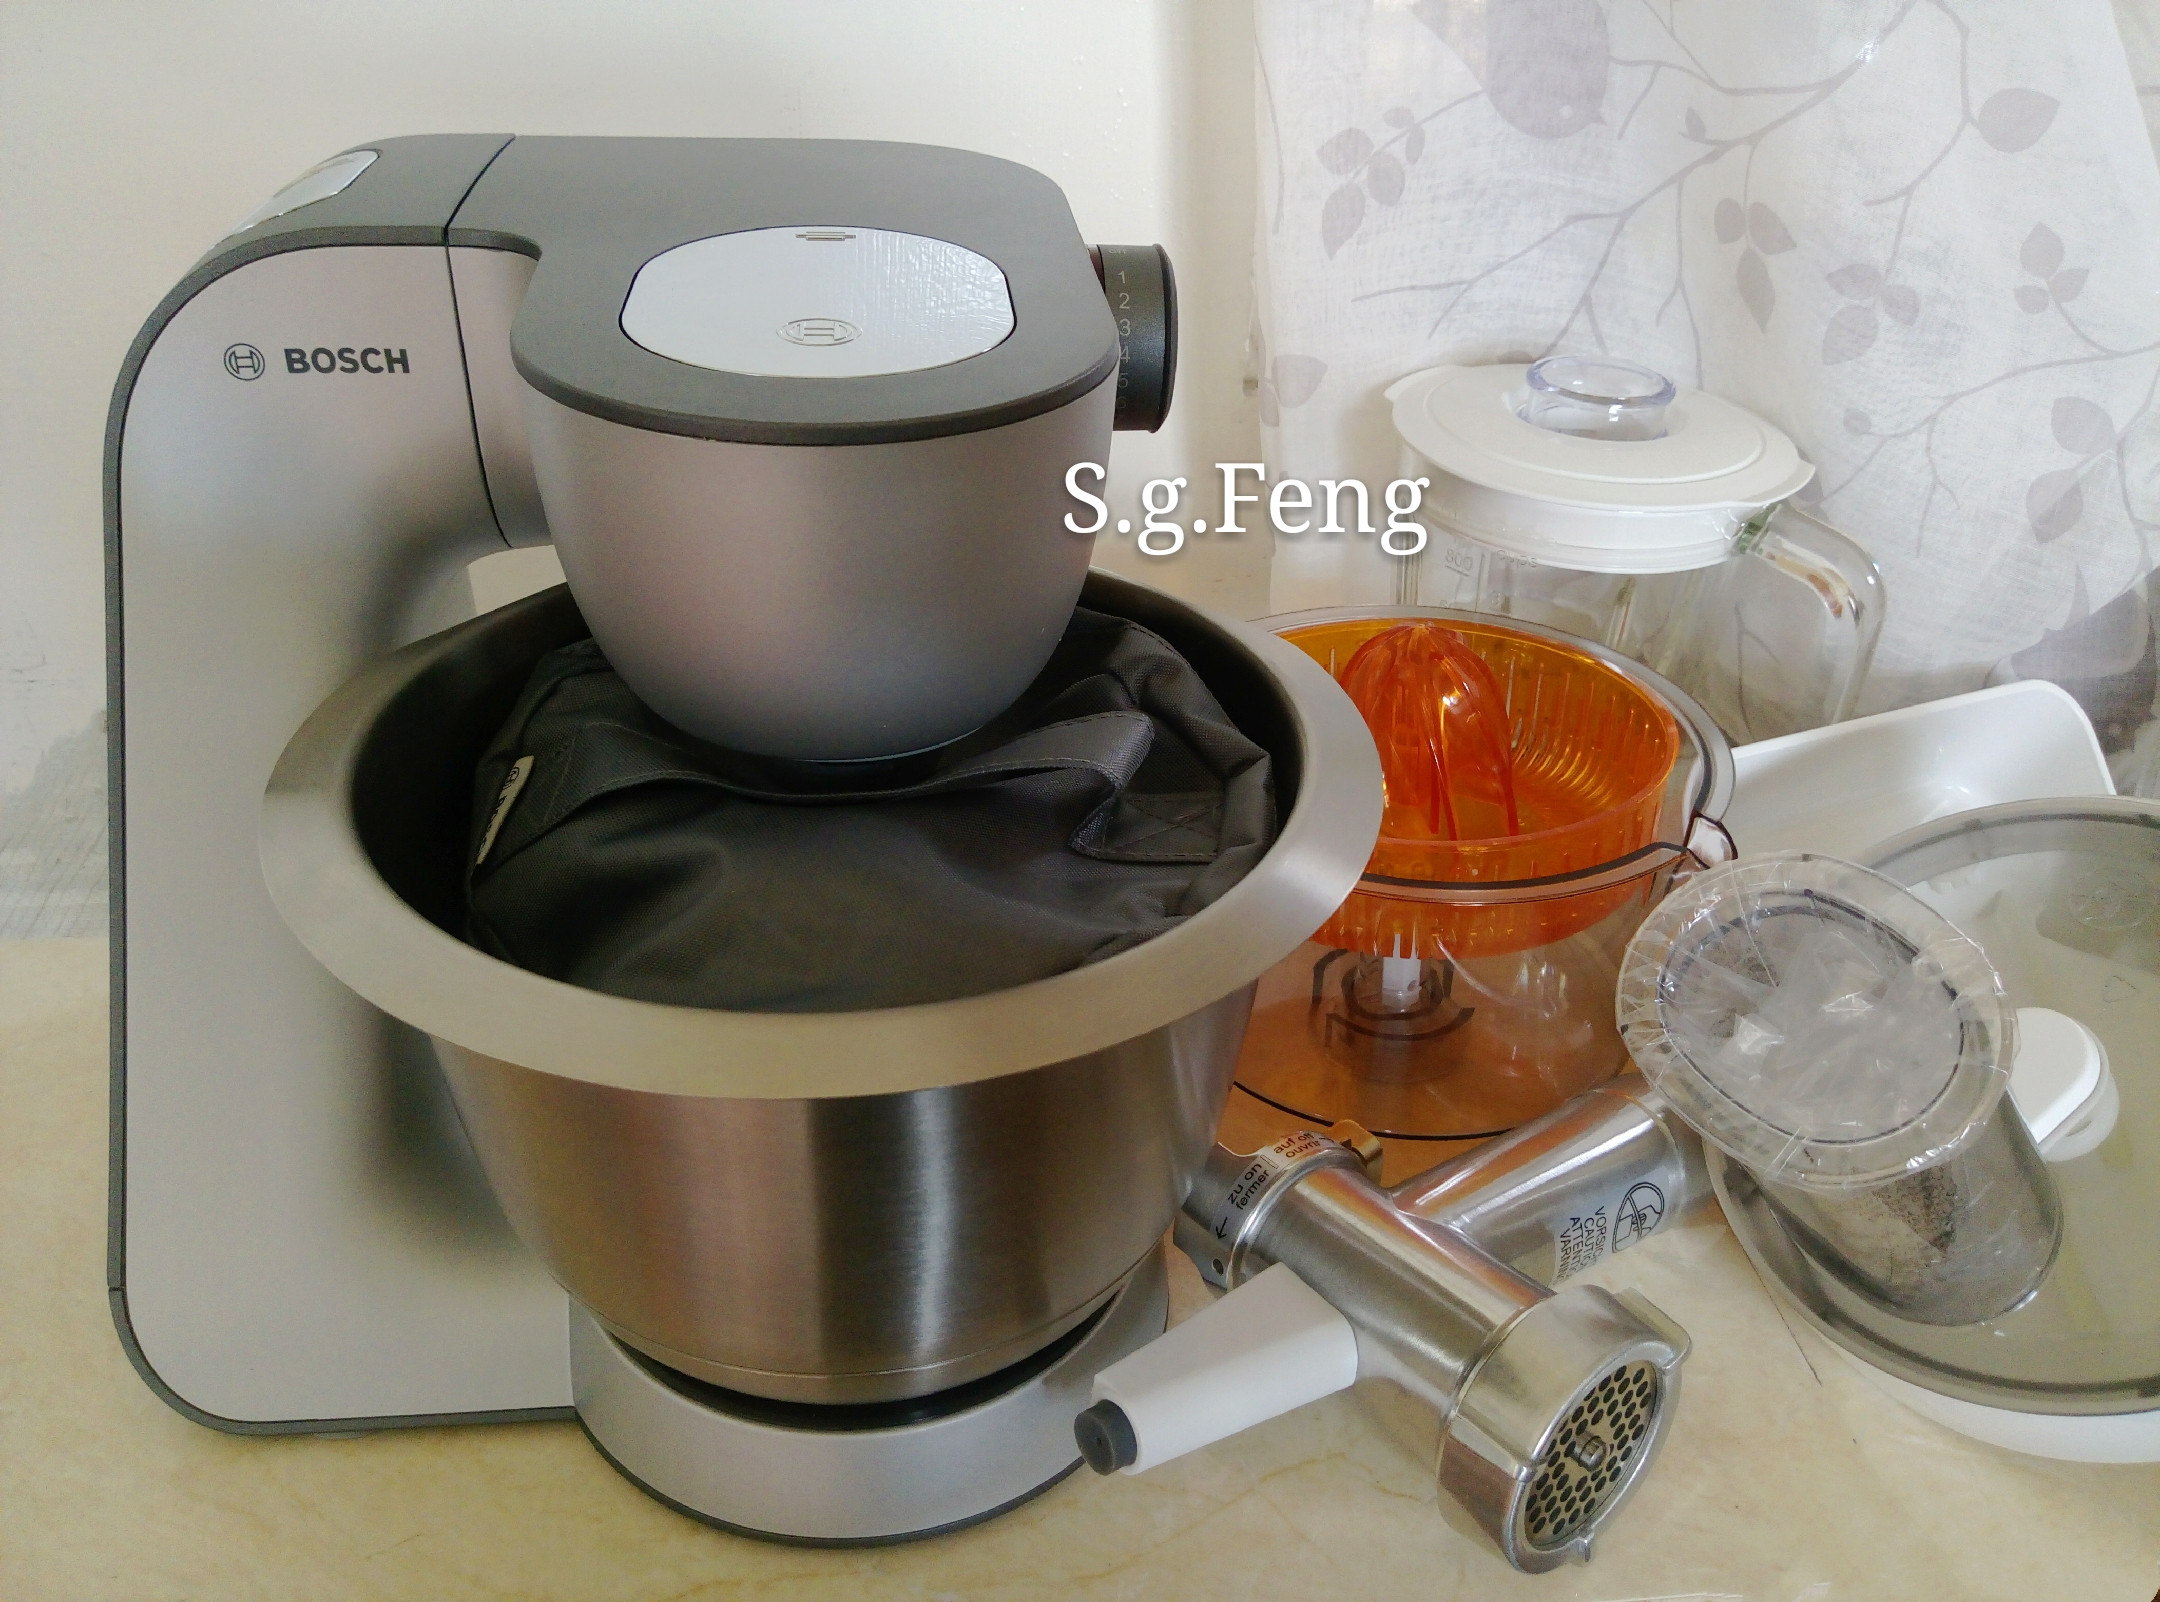 Bosch精湛萬用廚師機:完美攪打/省時省力/一機抵萬機的第 3 張圖片